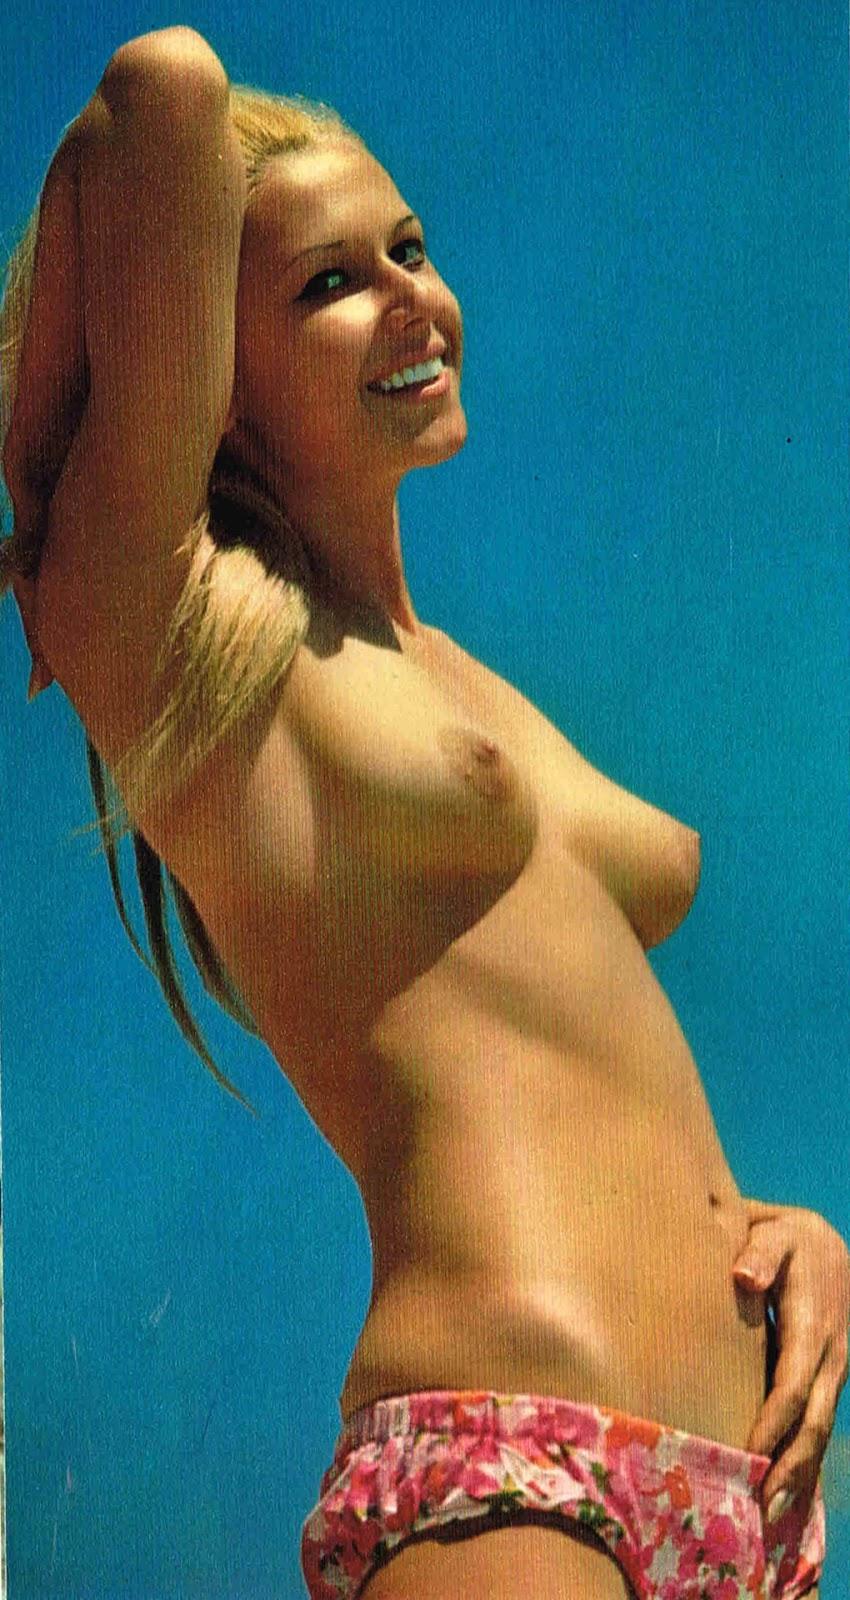 Diana ewing naked